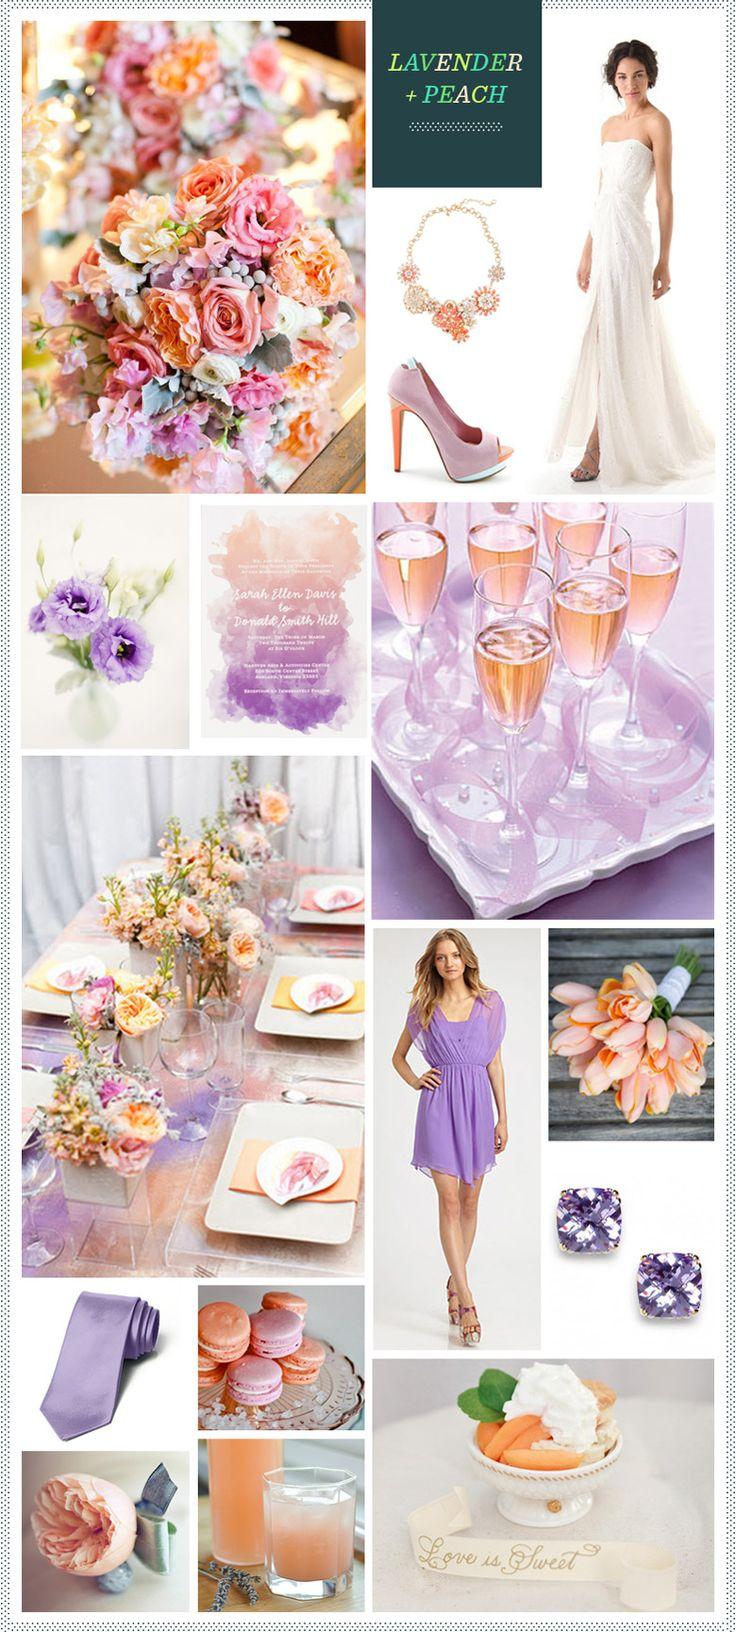 Lavender + Peach wedding inspiration